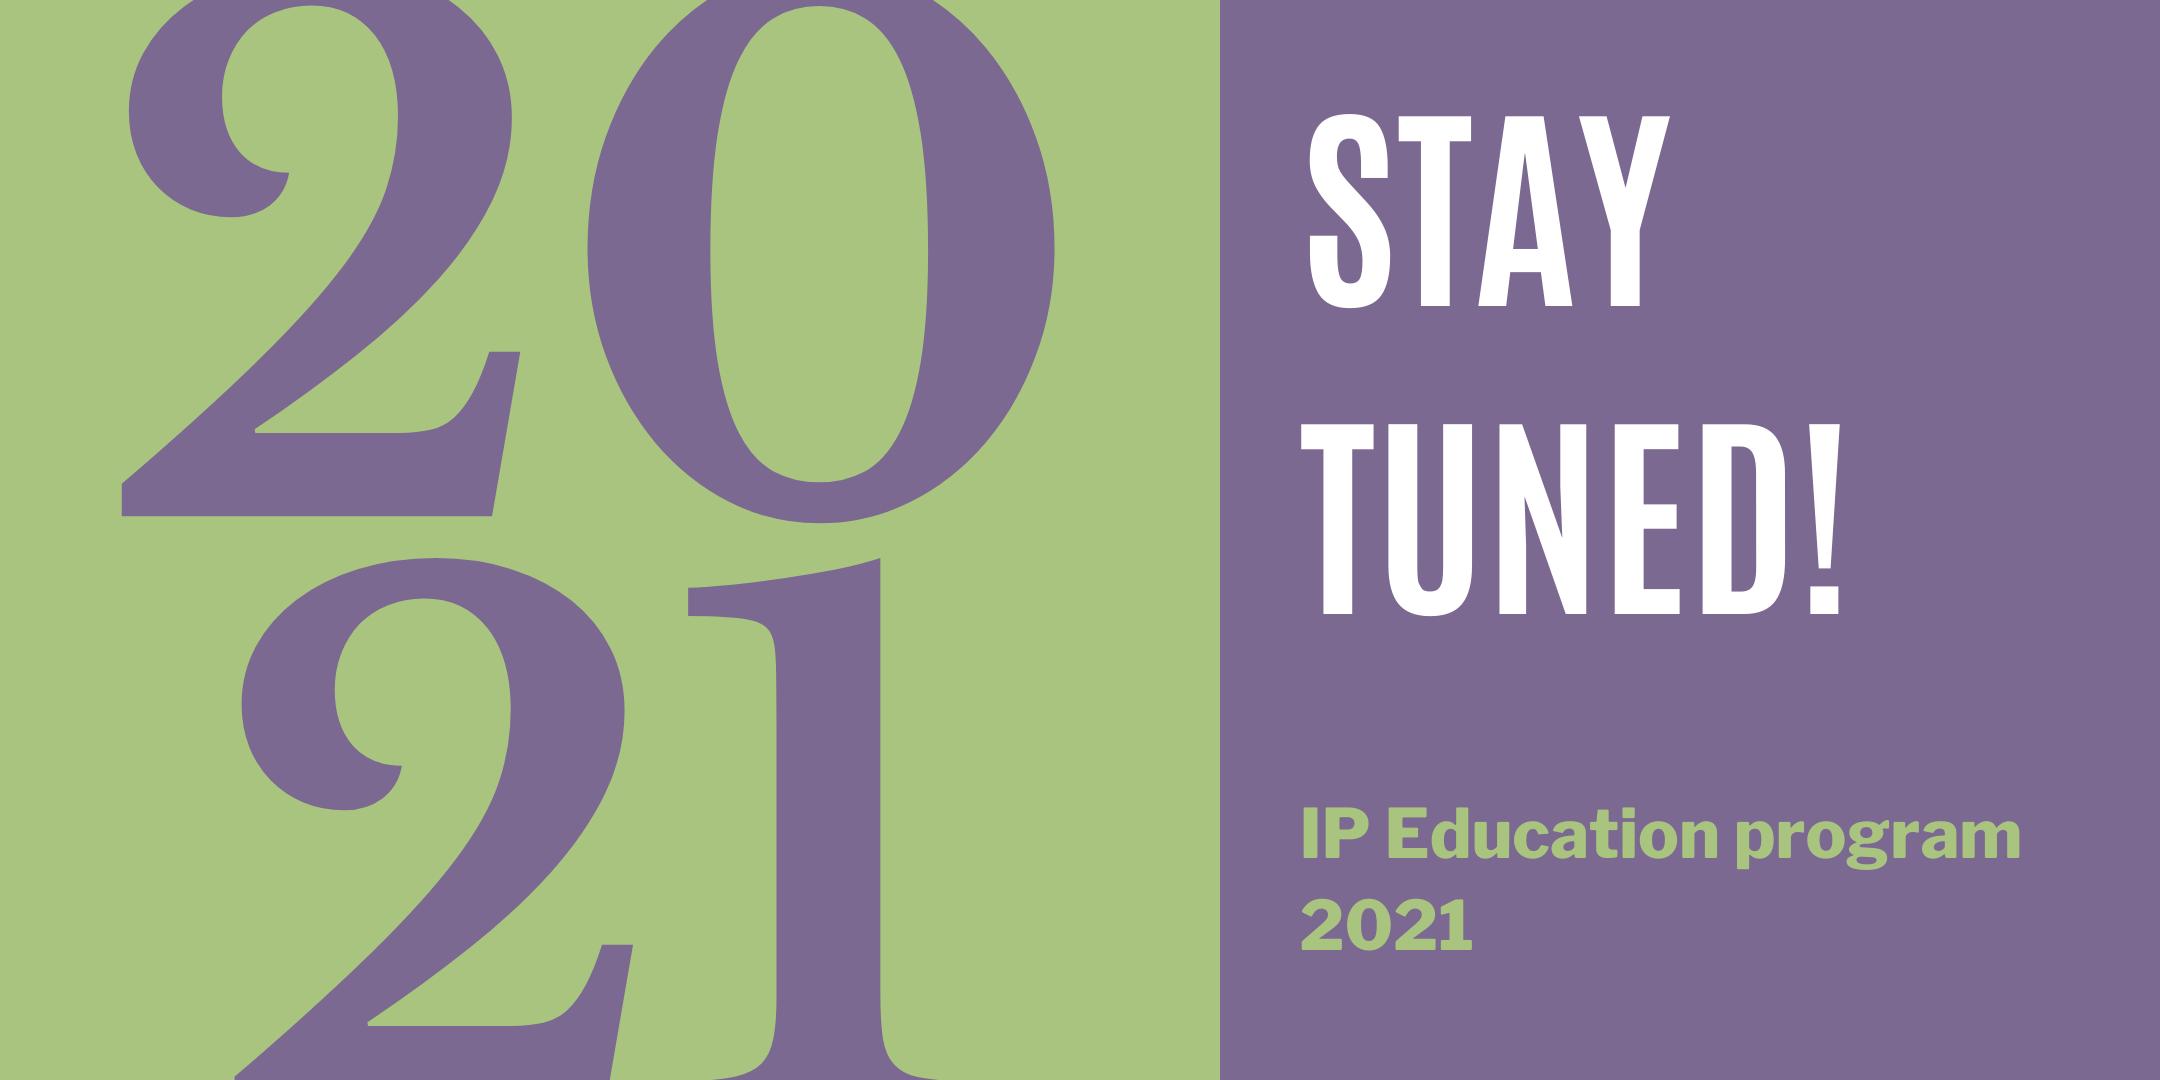 Stay tuned for the webinar (& workshop) program 2021!